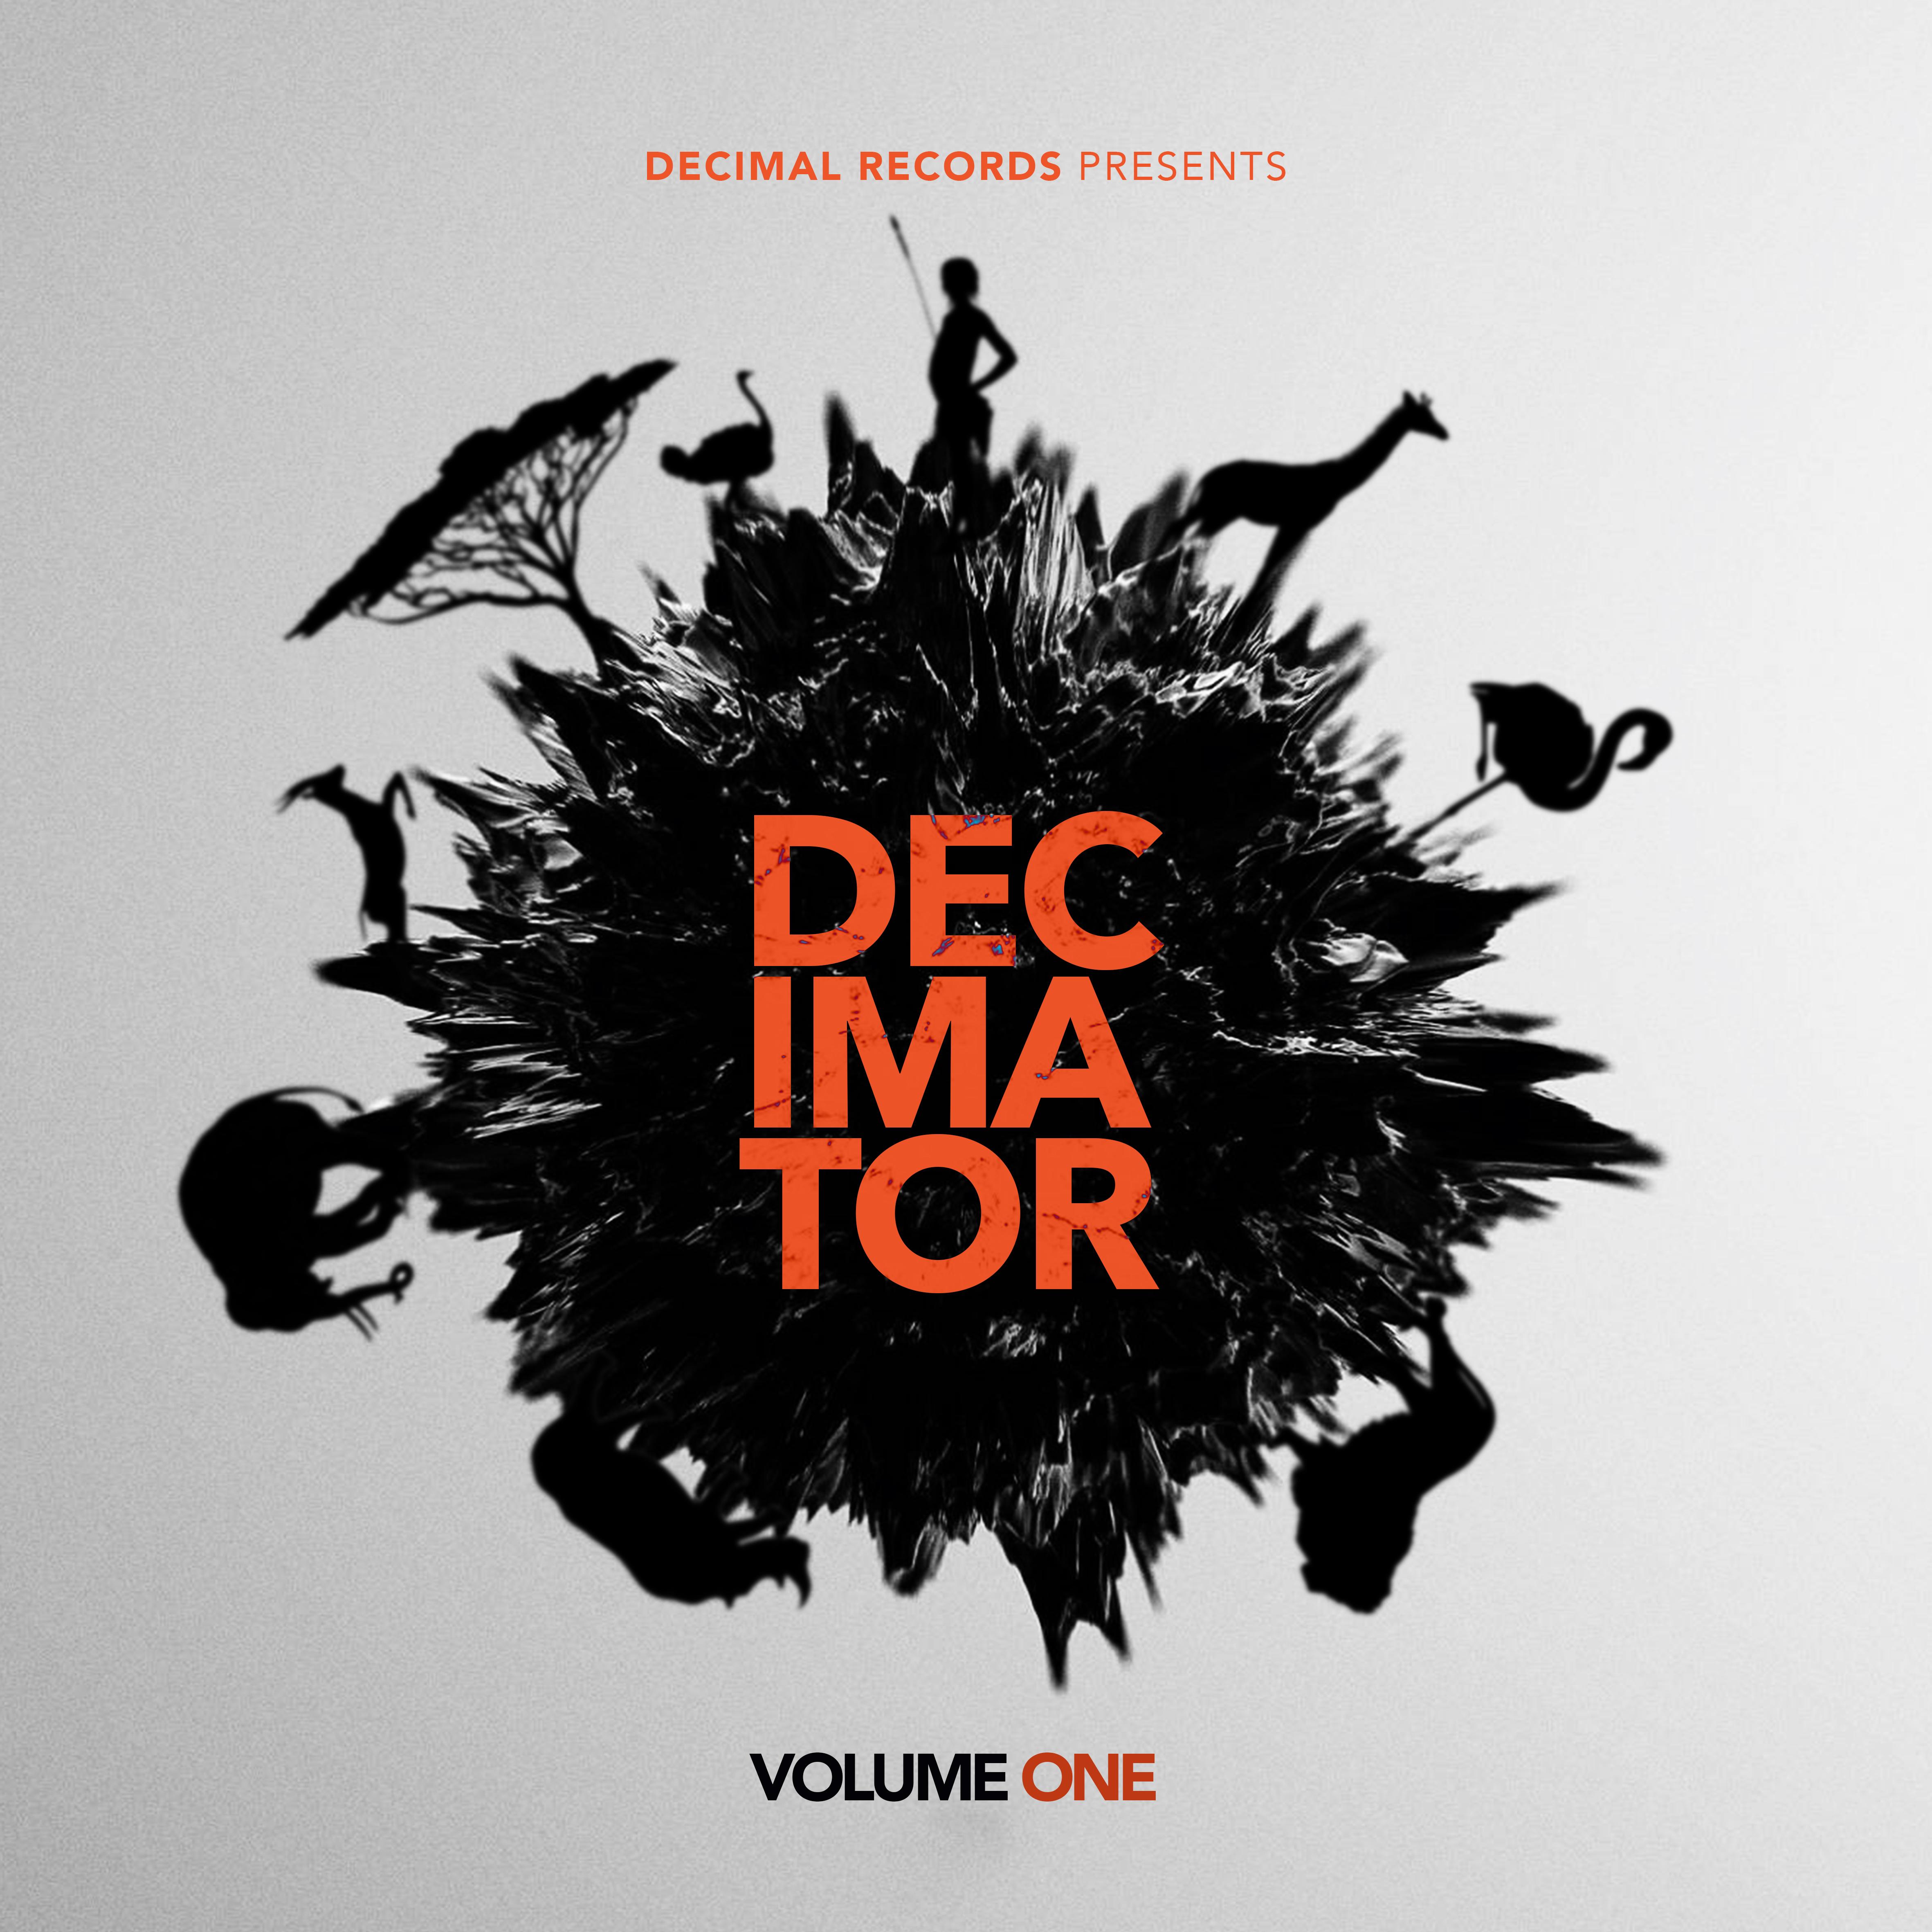 DECIMATOR CD FRONT DESIGN.jpg